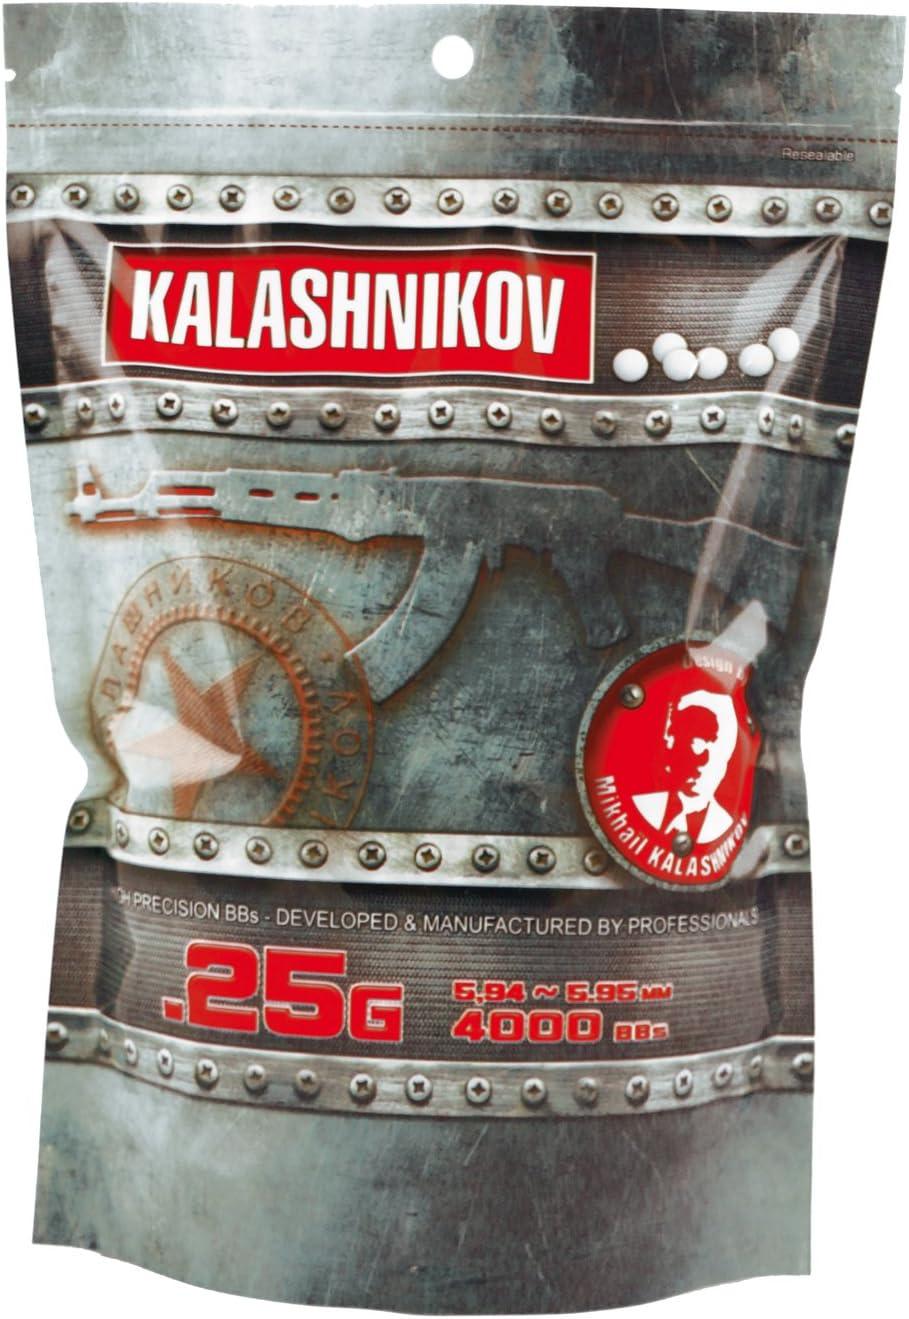 Kalashnikov Billes KALASHNIKOV 0,25 Gr - Balines de plástico para airsoft